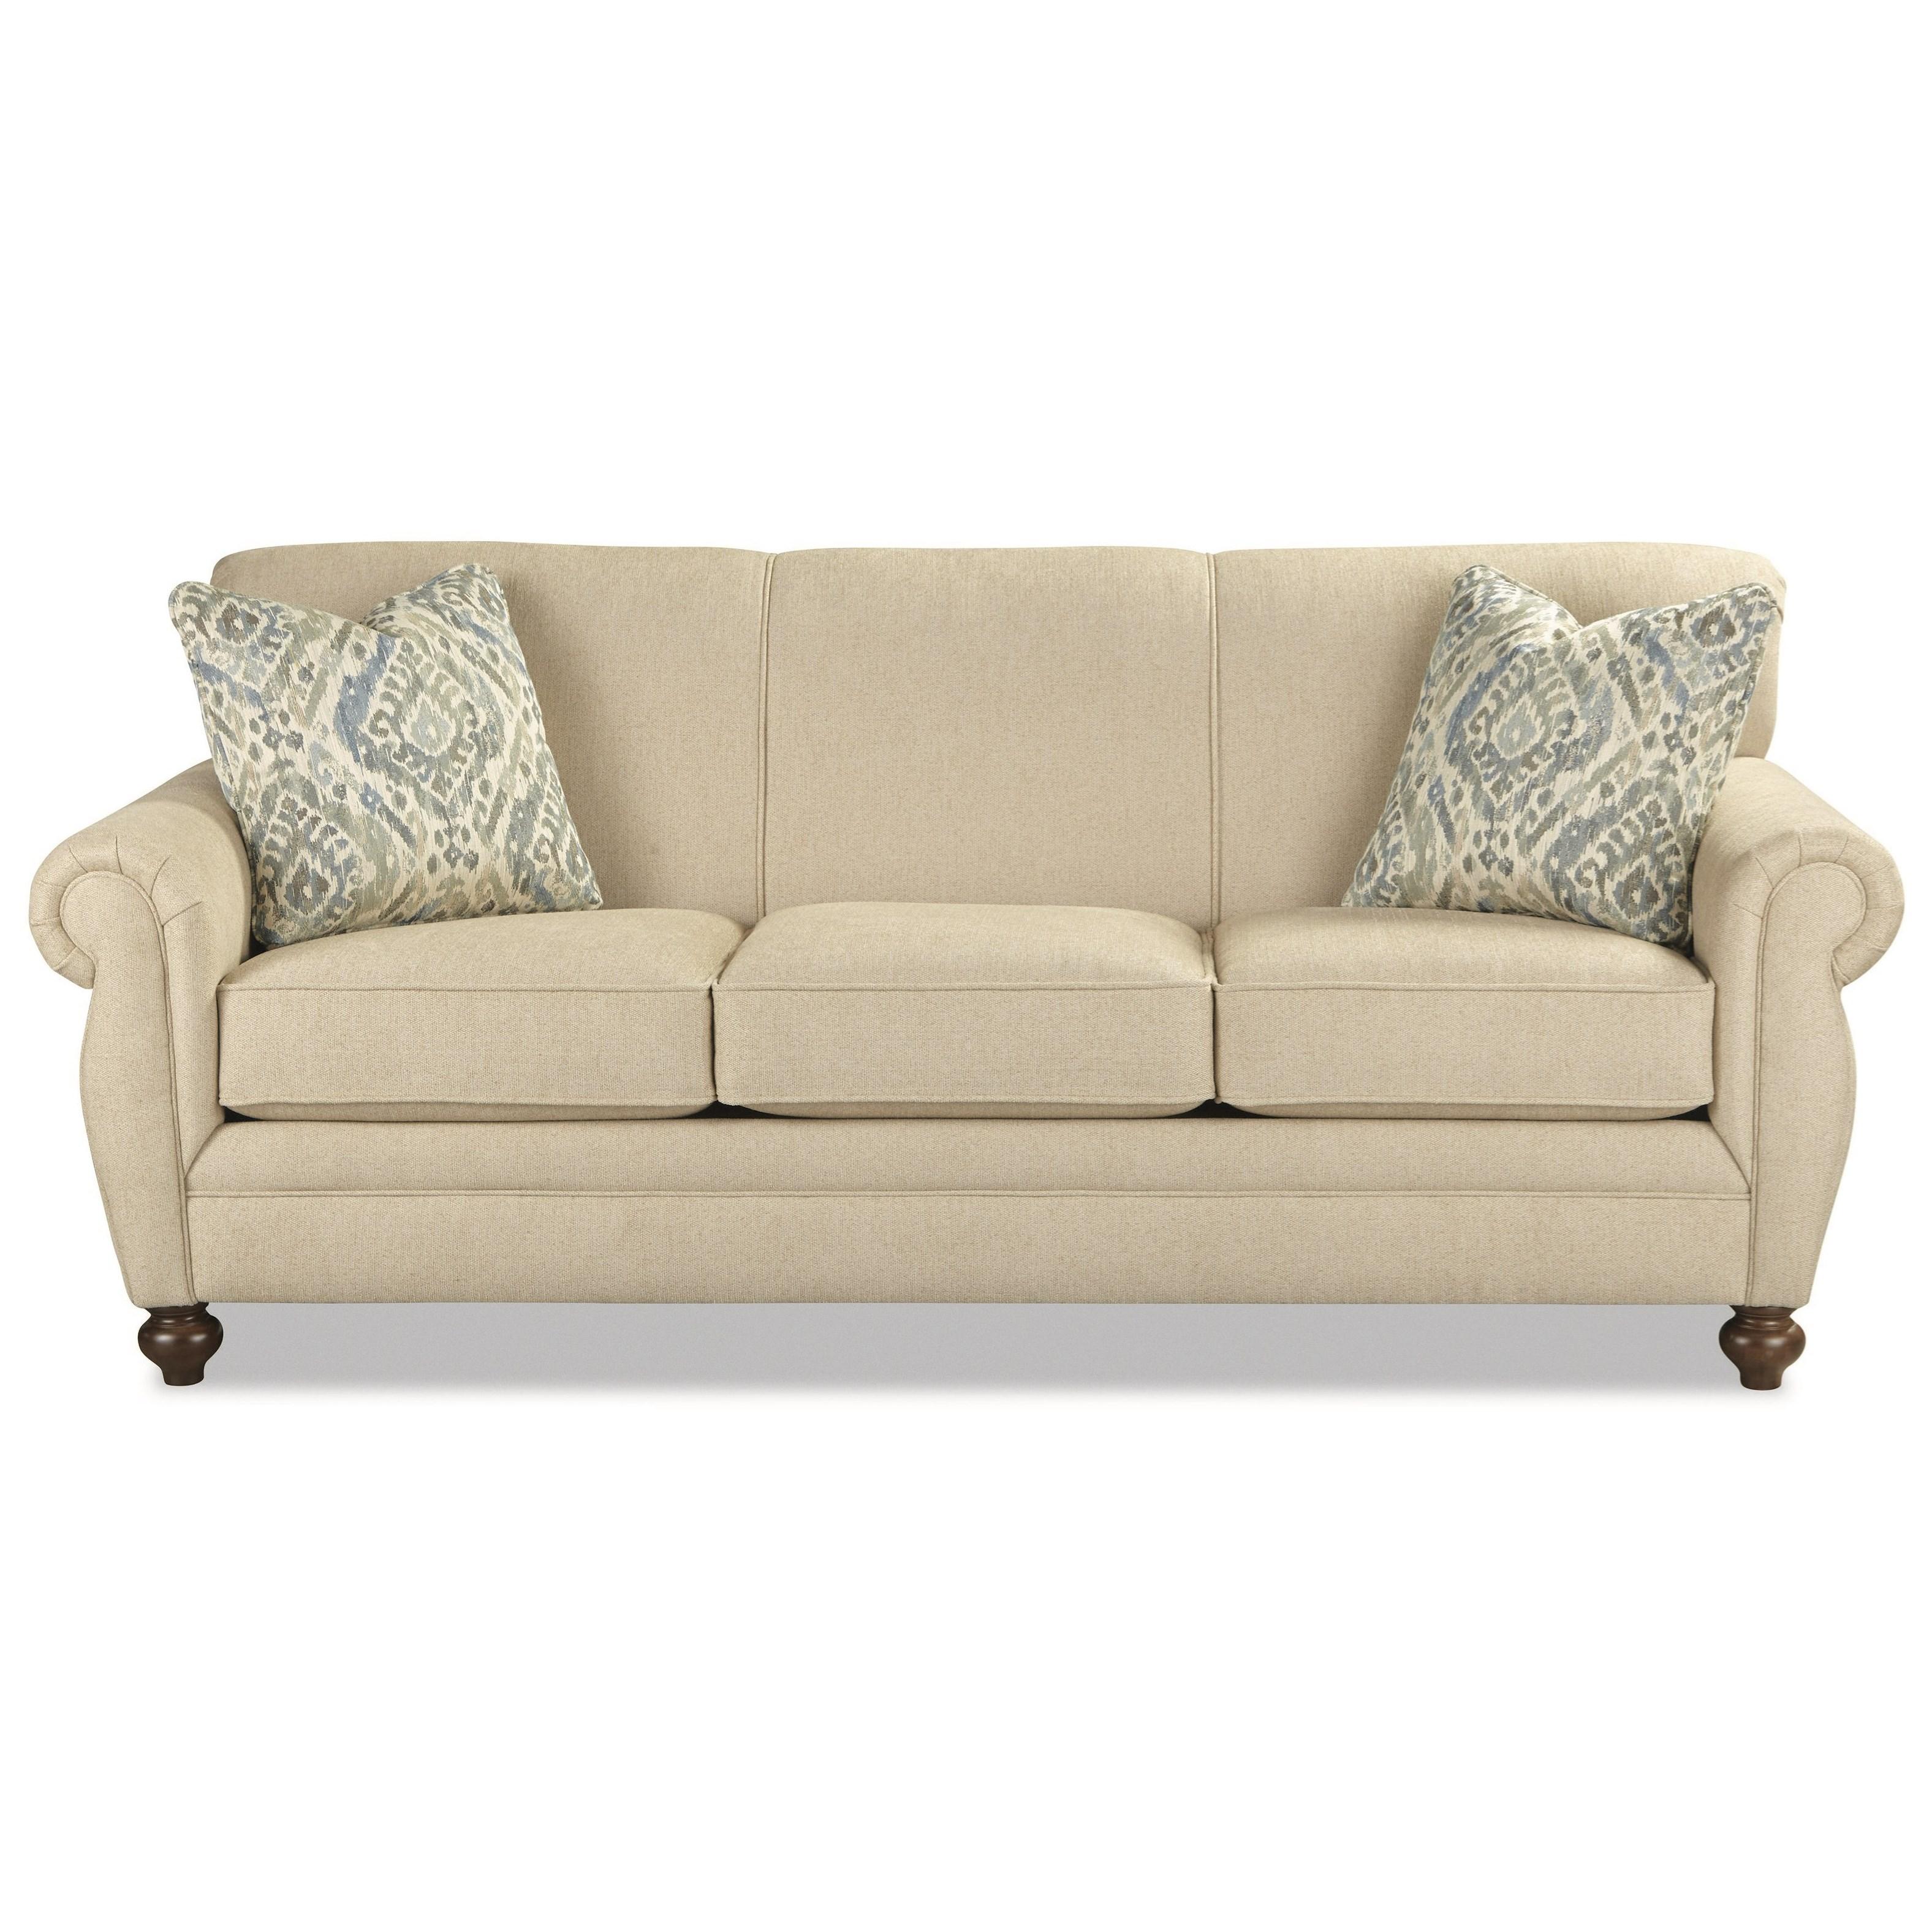 Craftmaster 7679 Sleeper Sofa w/ Memory Foam Mattress - Item Number: 767950-98-EXCEL-10